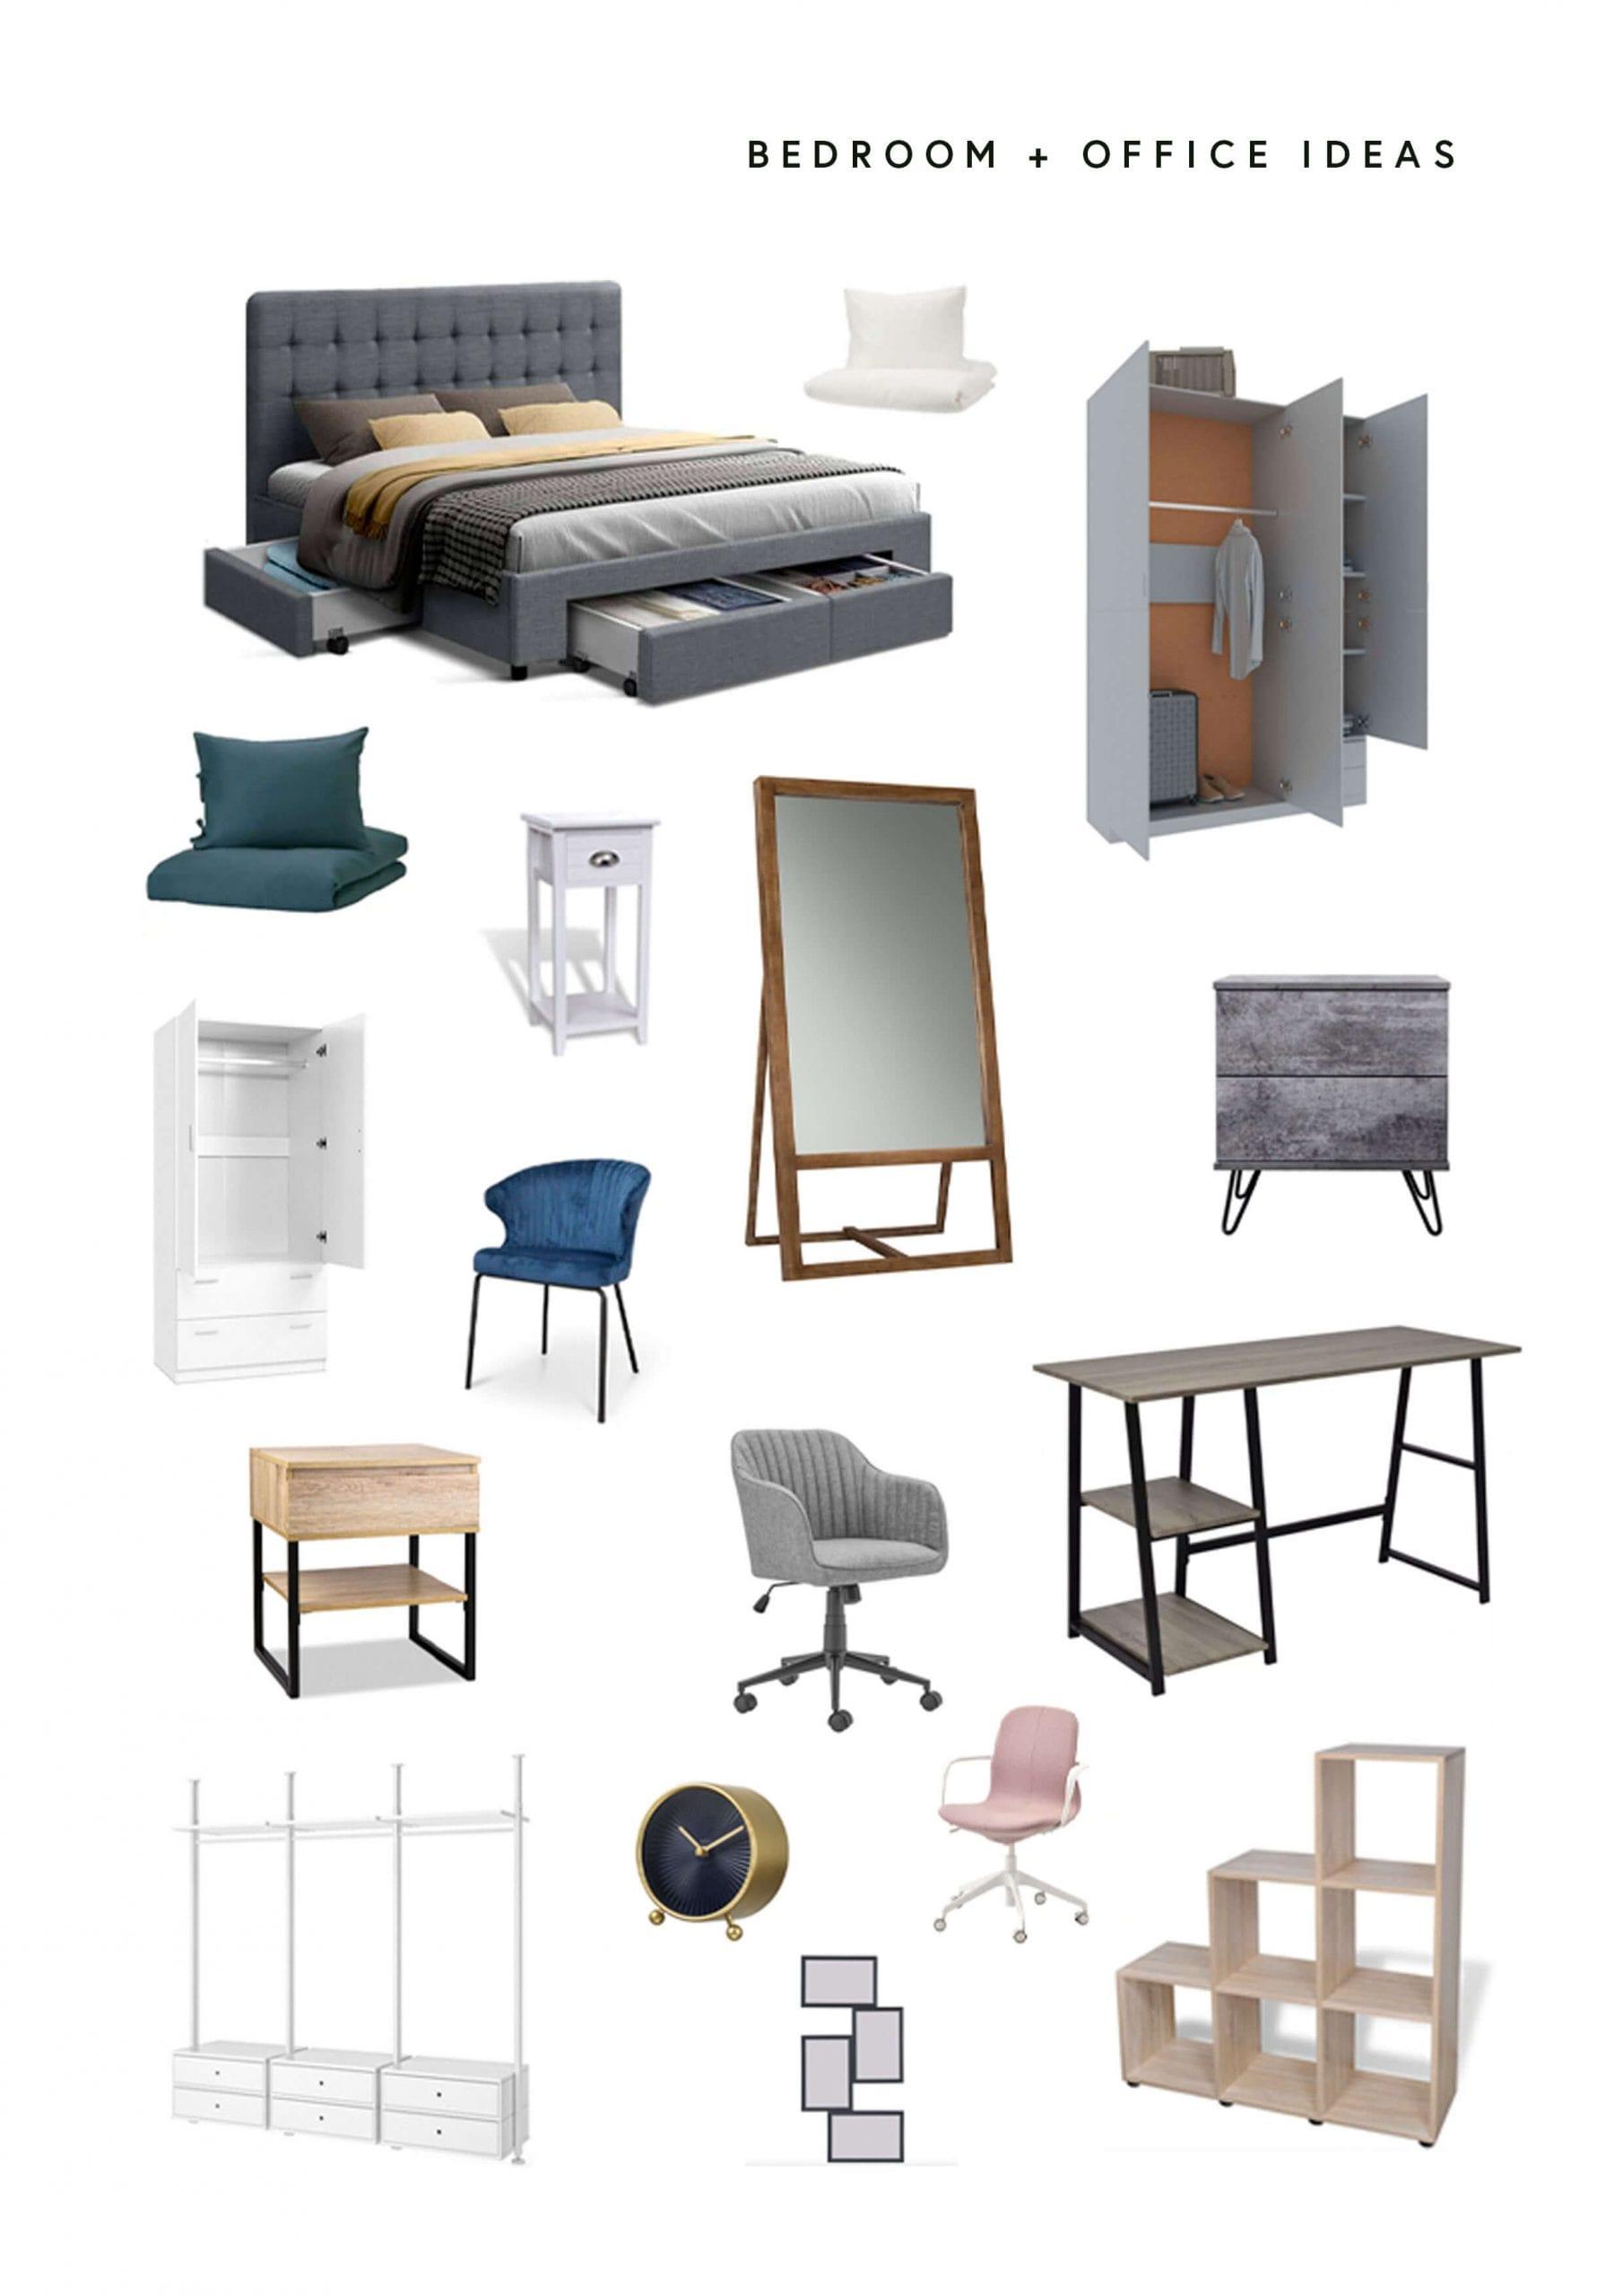 ann-rod-interior-styling-advice-bedroom-office-ideas